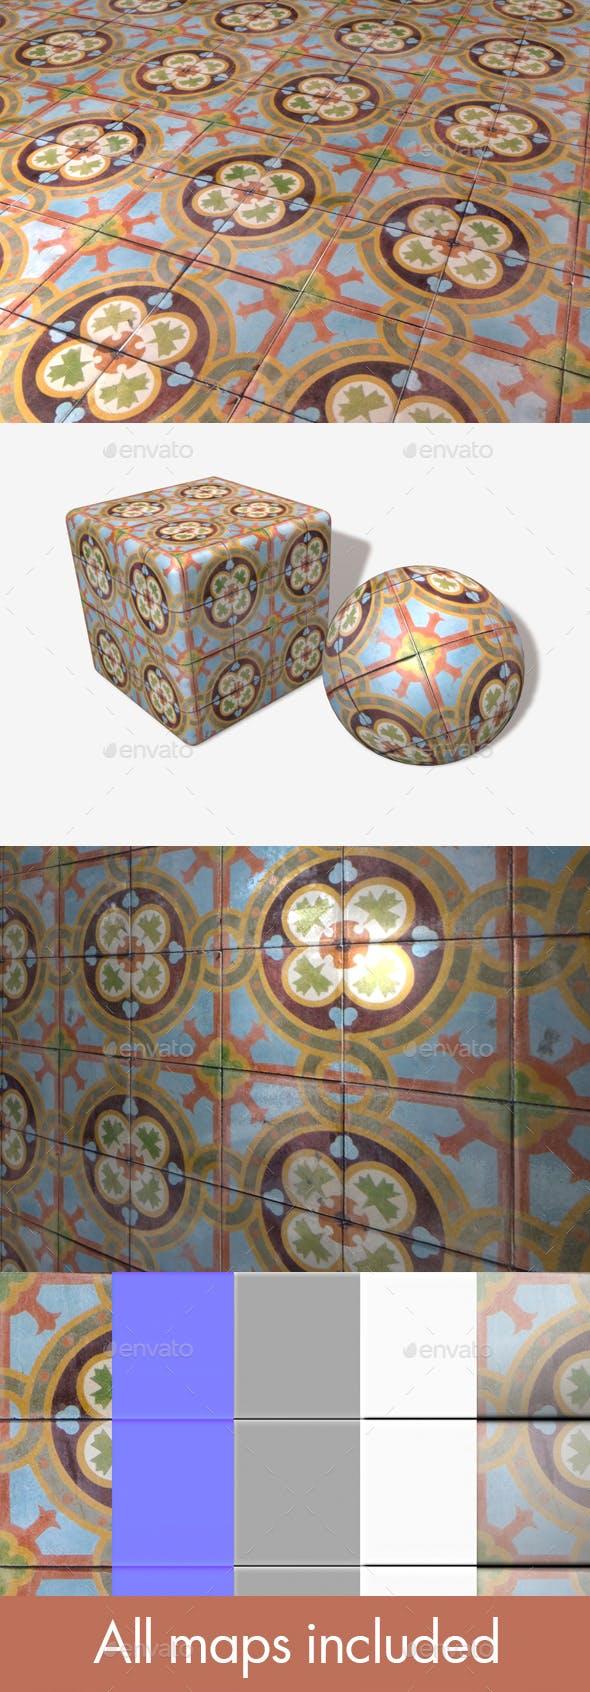 Dirty Patterned Floor Tiles Seamless - 3DOcean Item for Sale